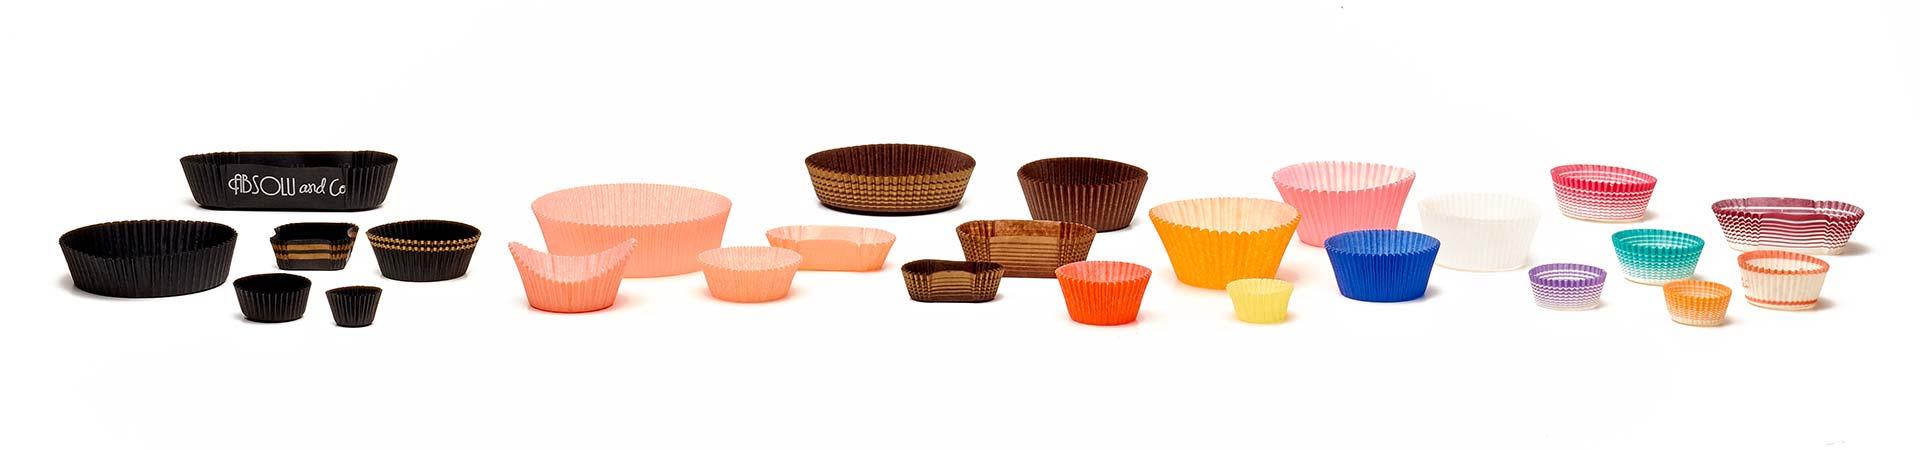 Novacart Display Paper Baking Cups